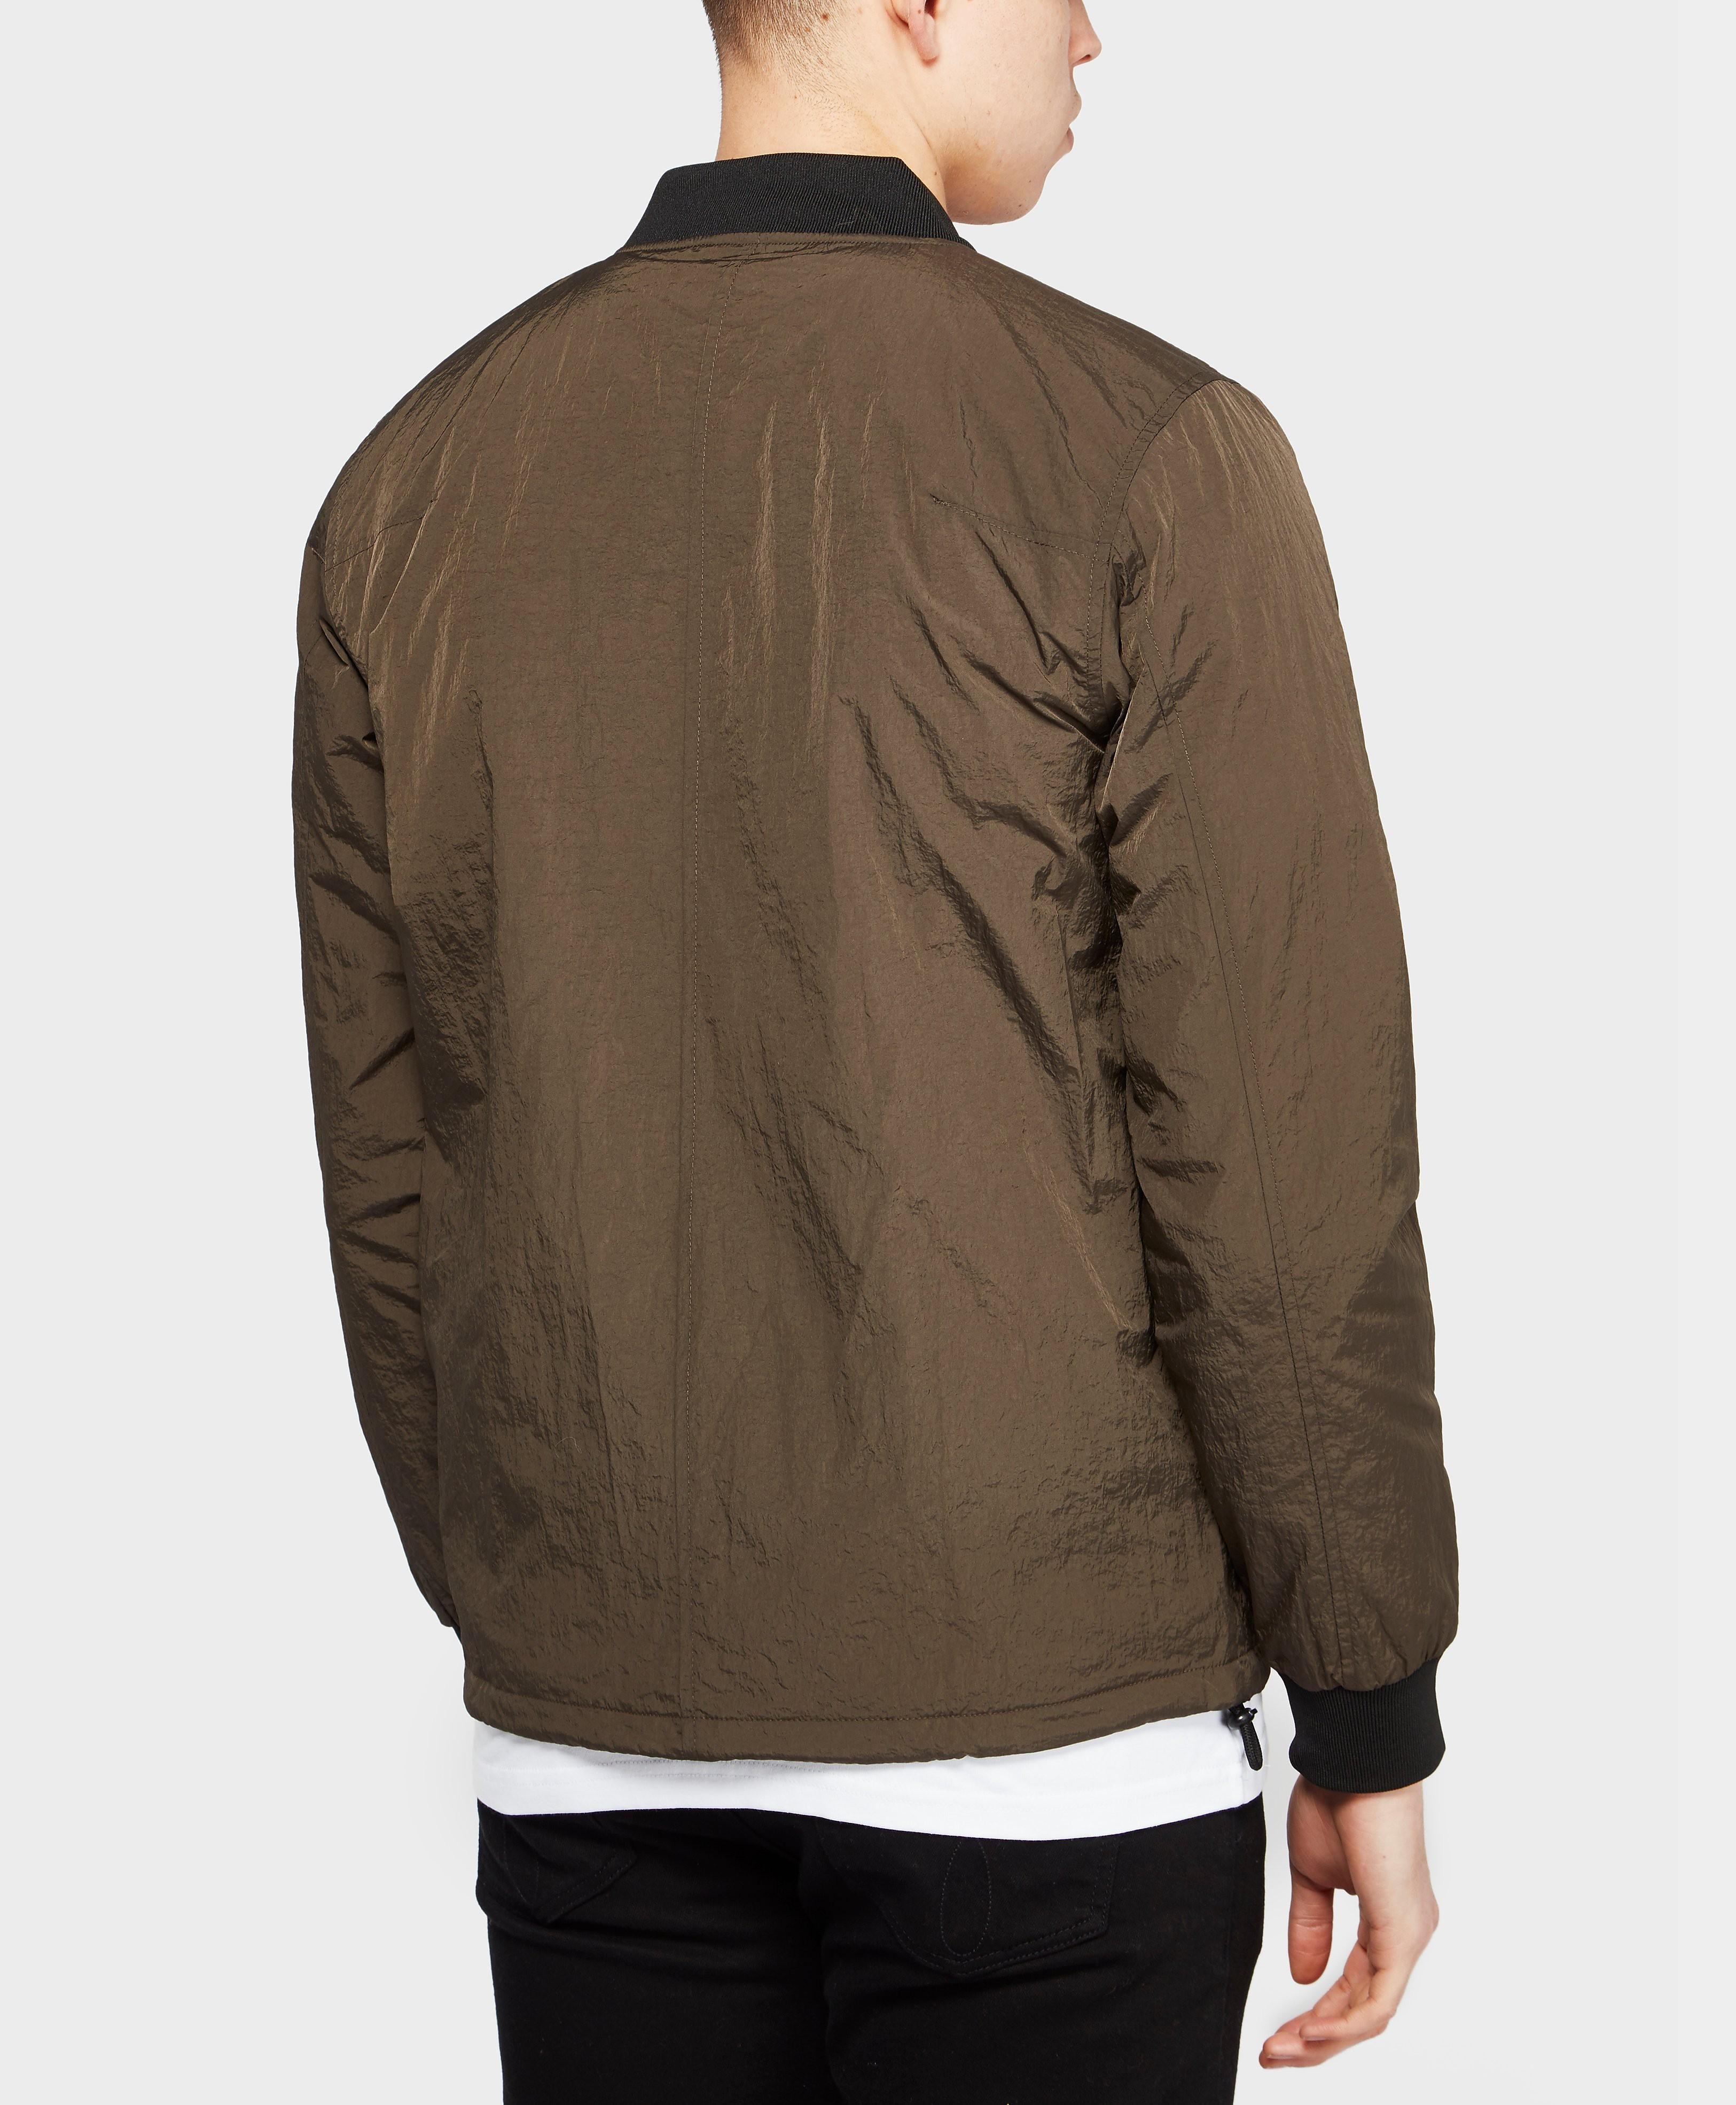 Marshall Artist Compact Lightweight Bomber Jacket